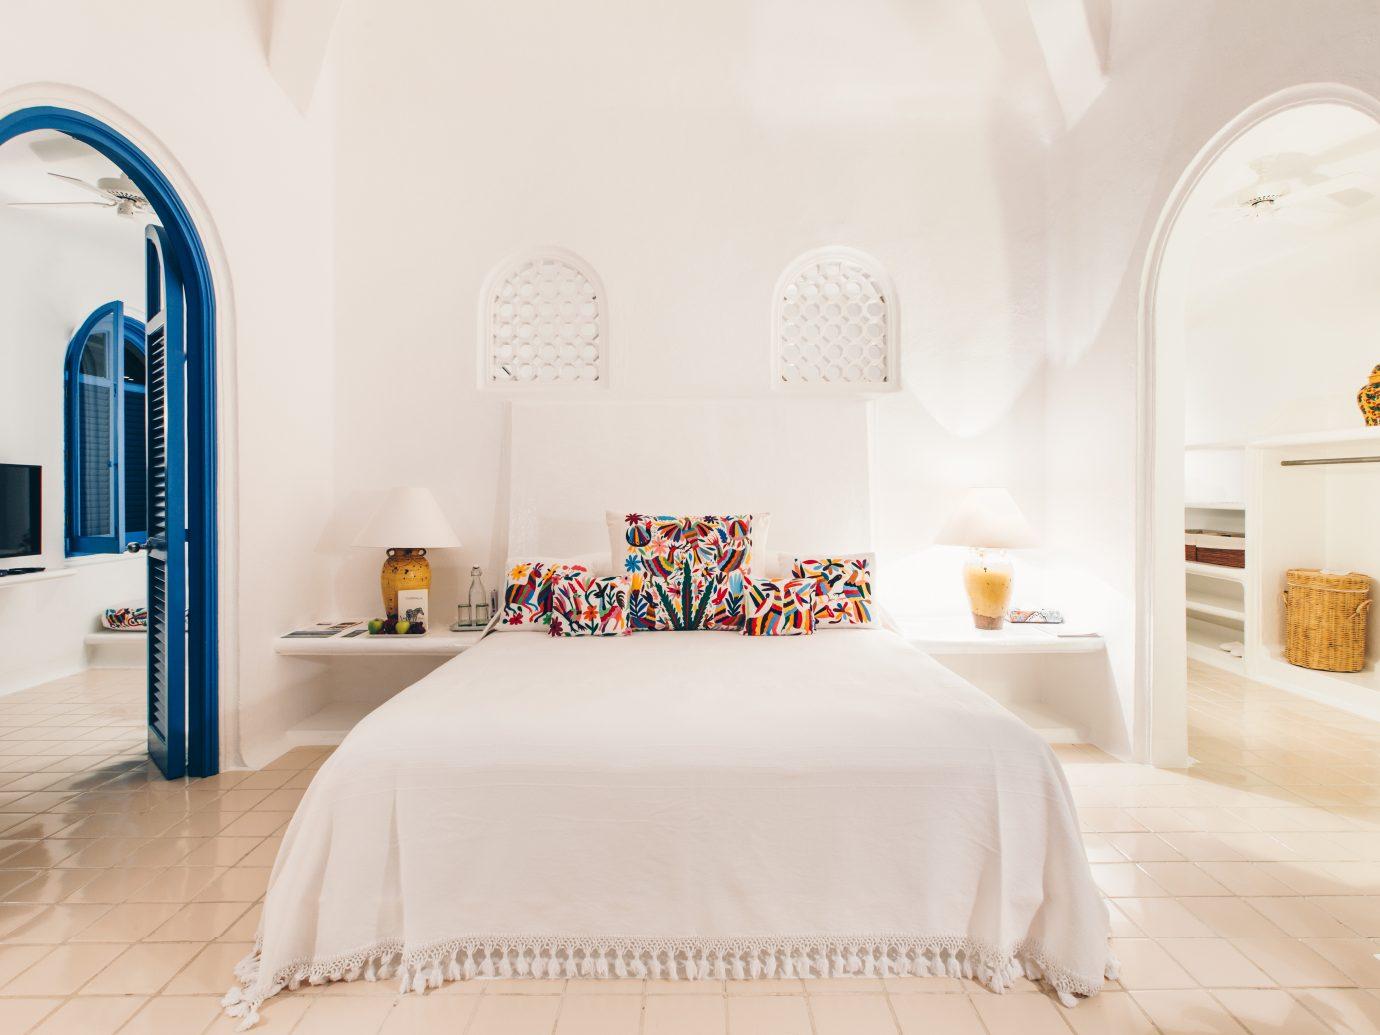 Bedroom at Cuixmala in Holbox, Mexico.